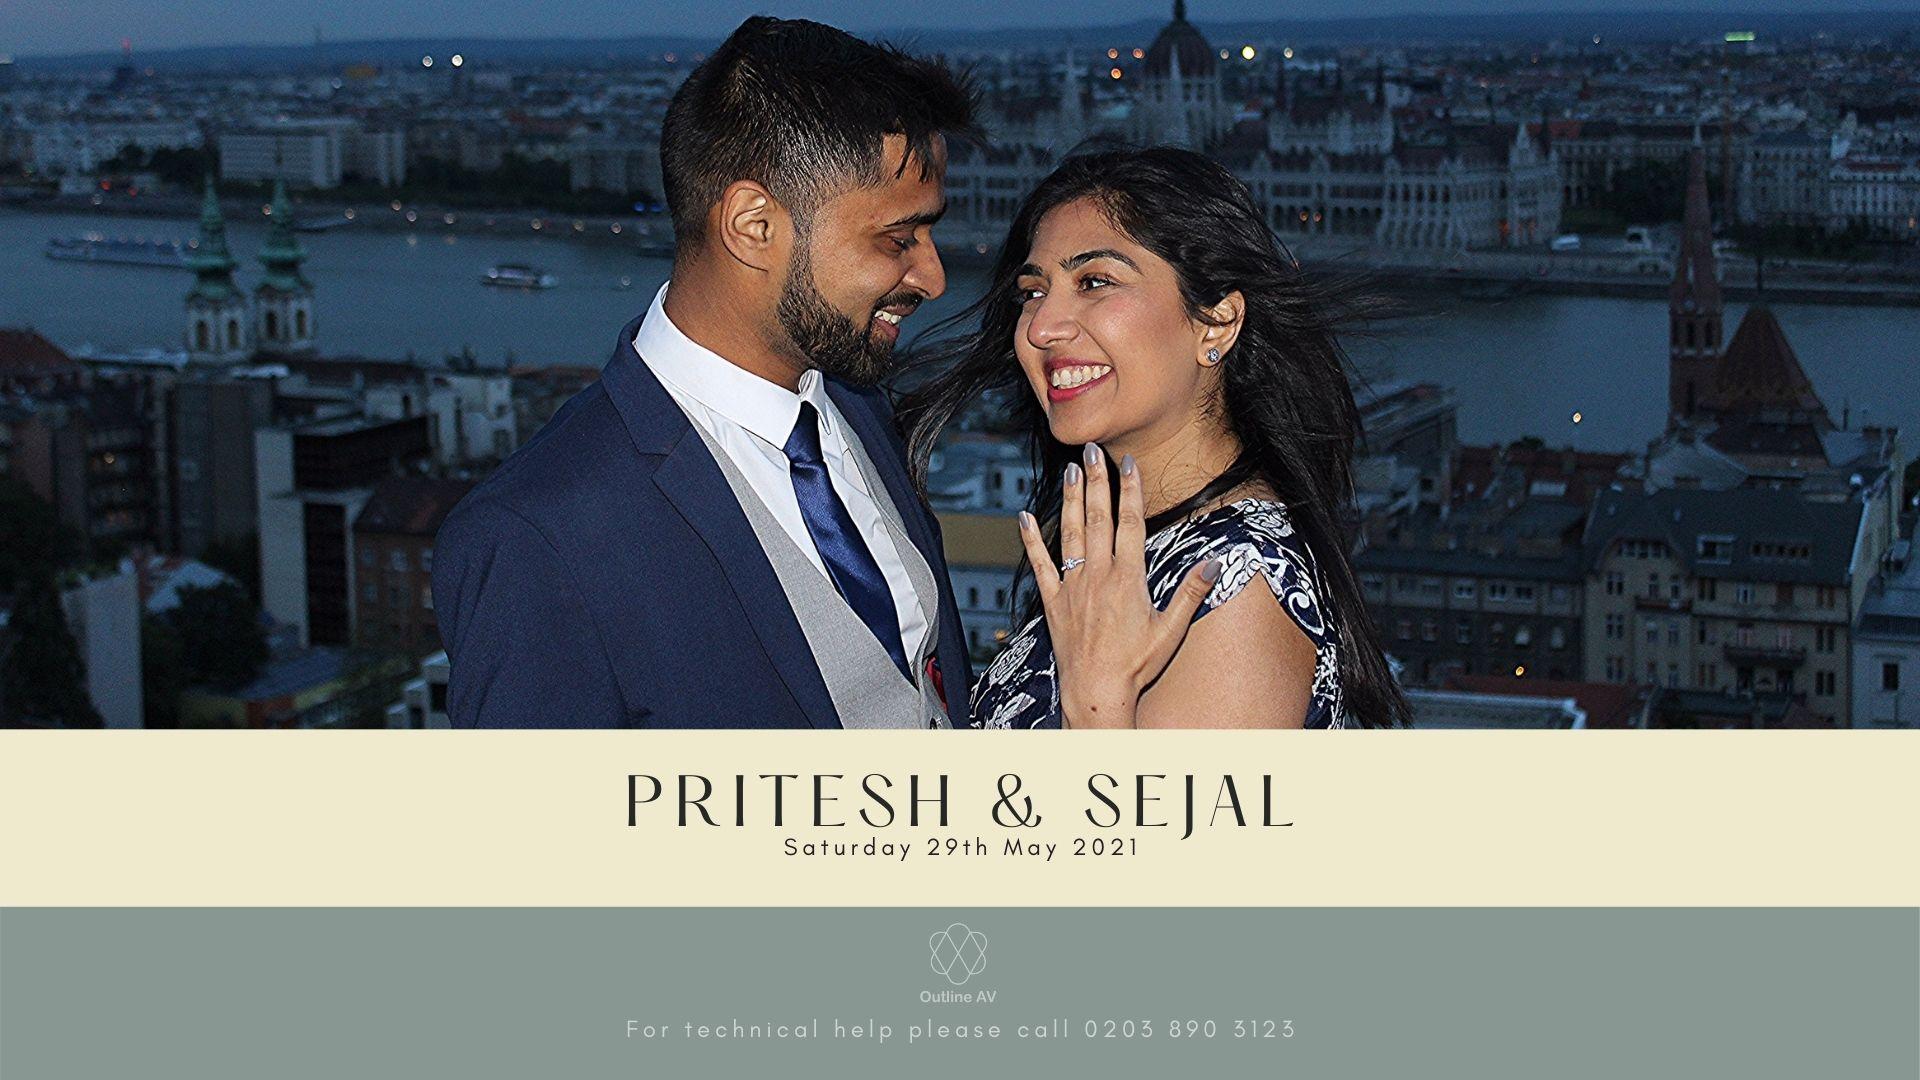 Pritesh & Sejal - Live Stream